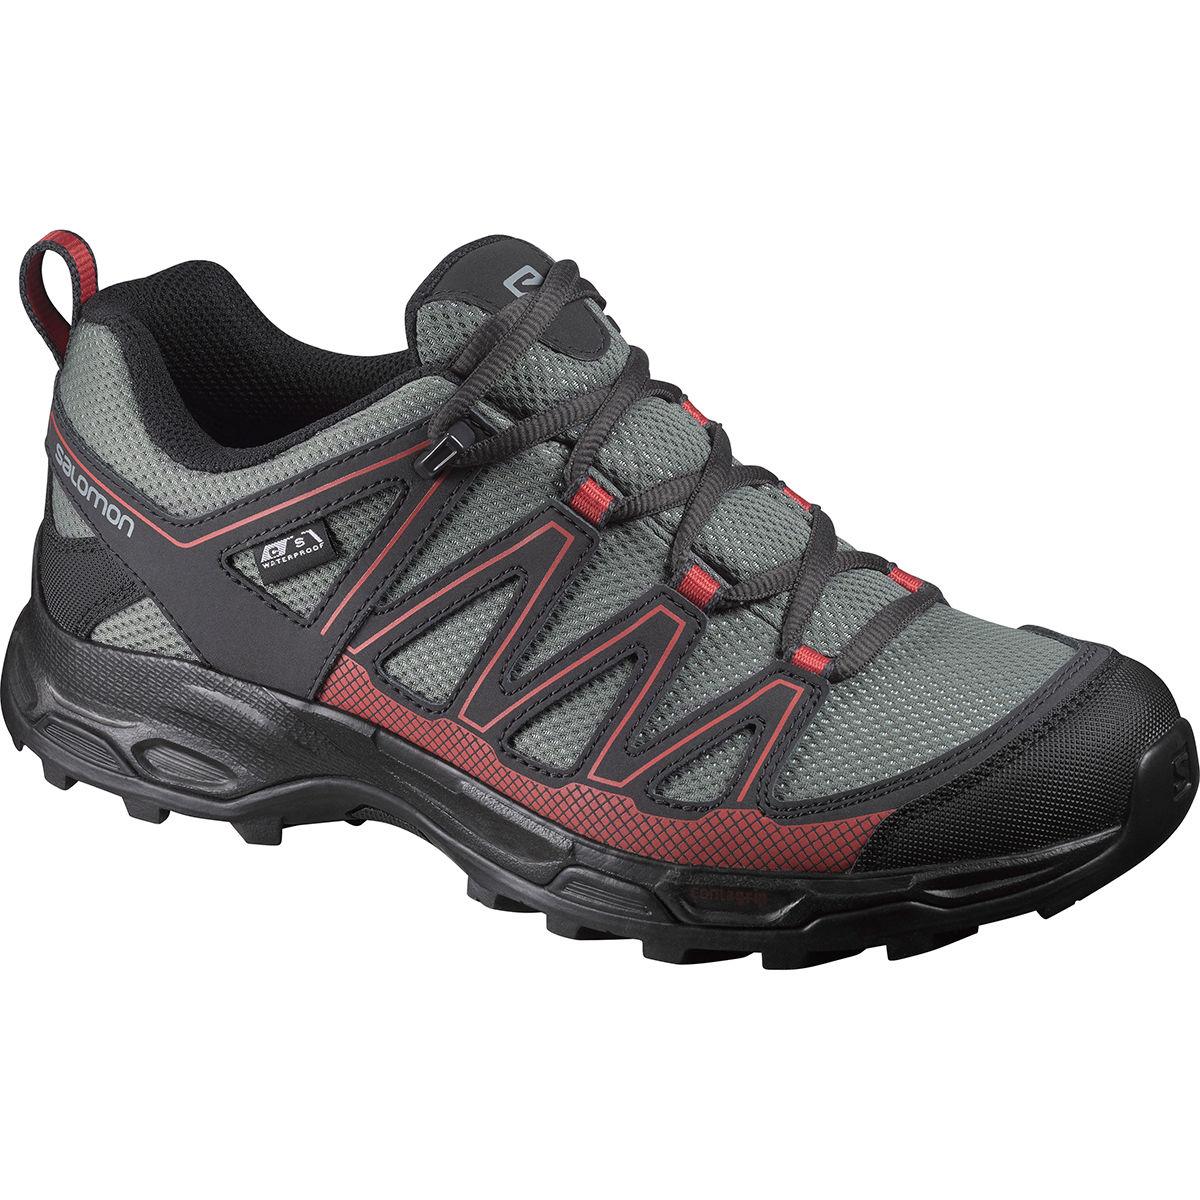 Salomon Women's Pathfinder Low Climashield Waterproof Hiking Shoes - Black, 7